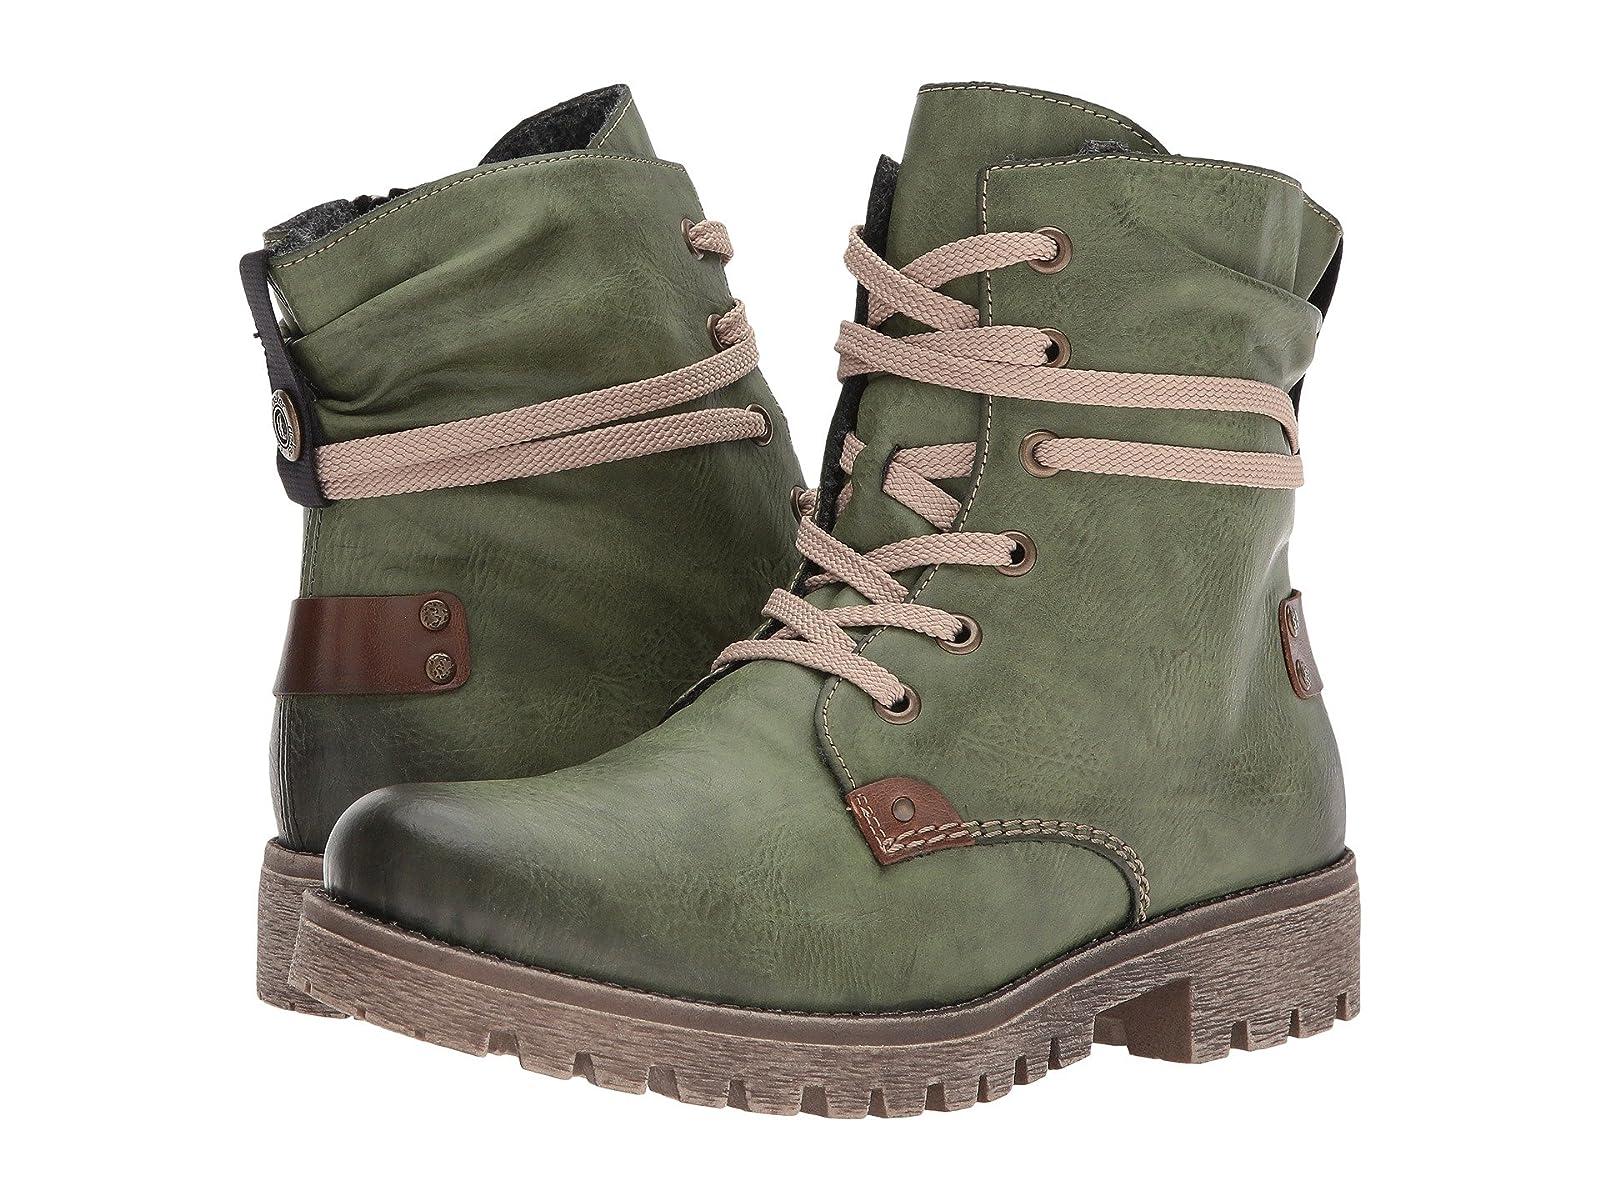 Rieker 78530 Payton 30Cheap and distinctive eye-catching shoes